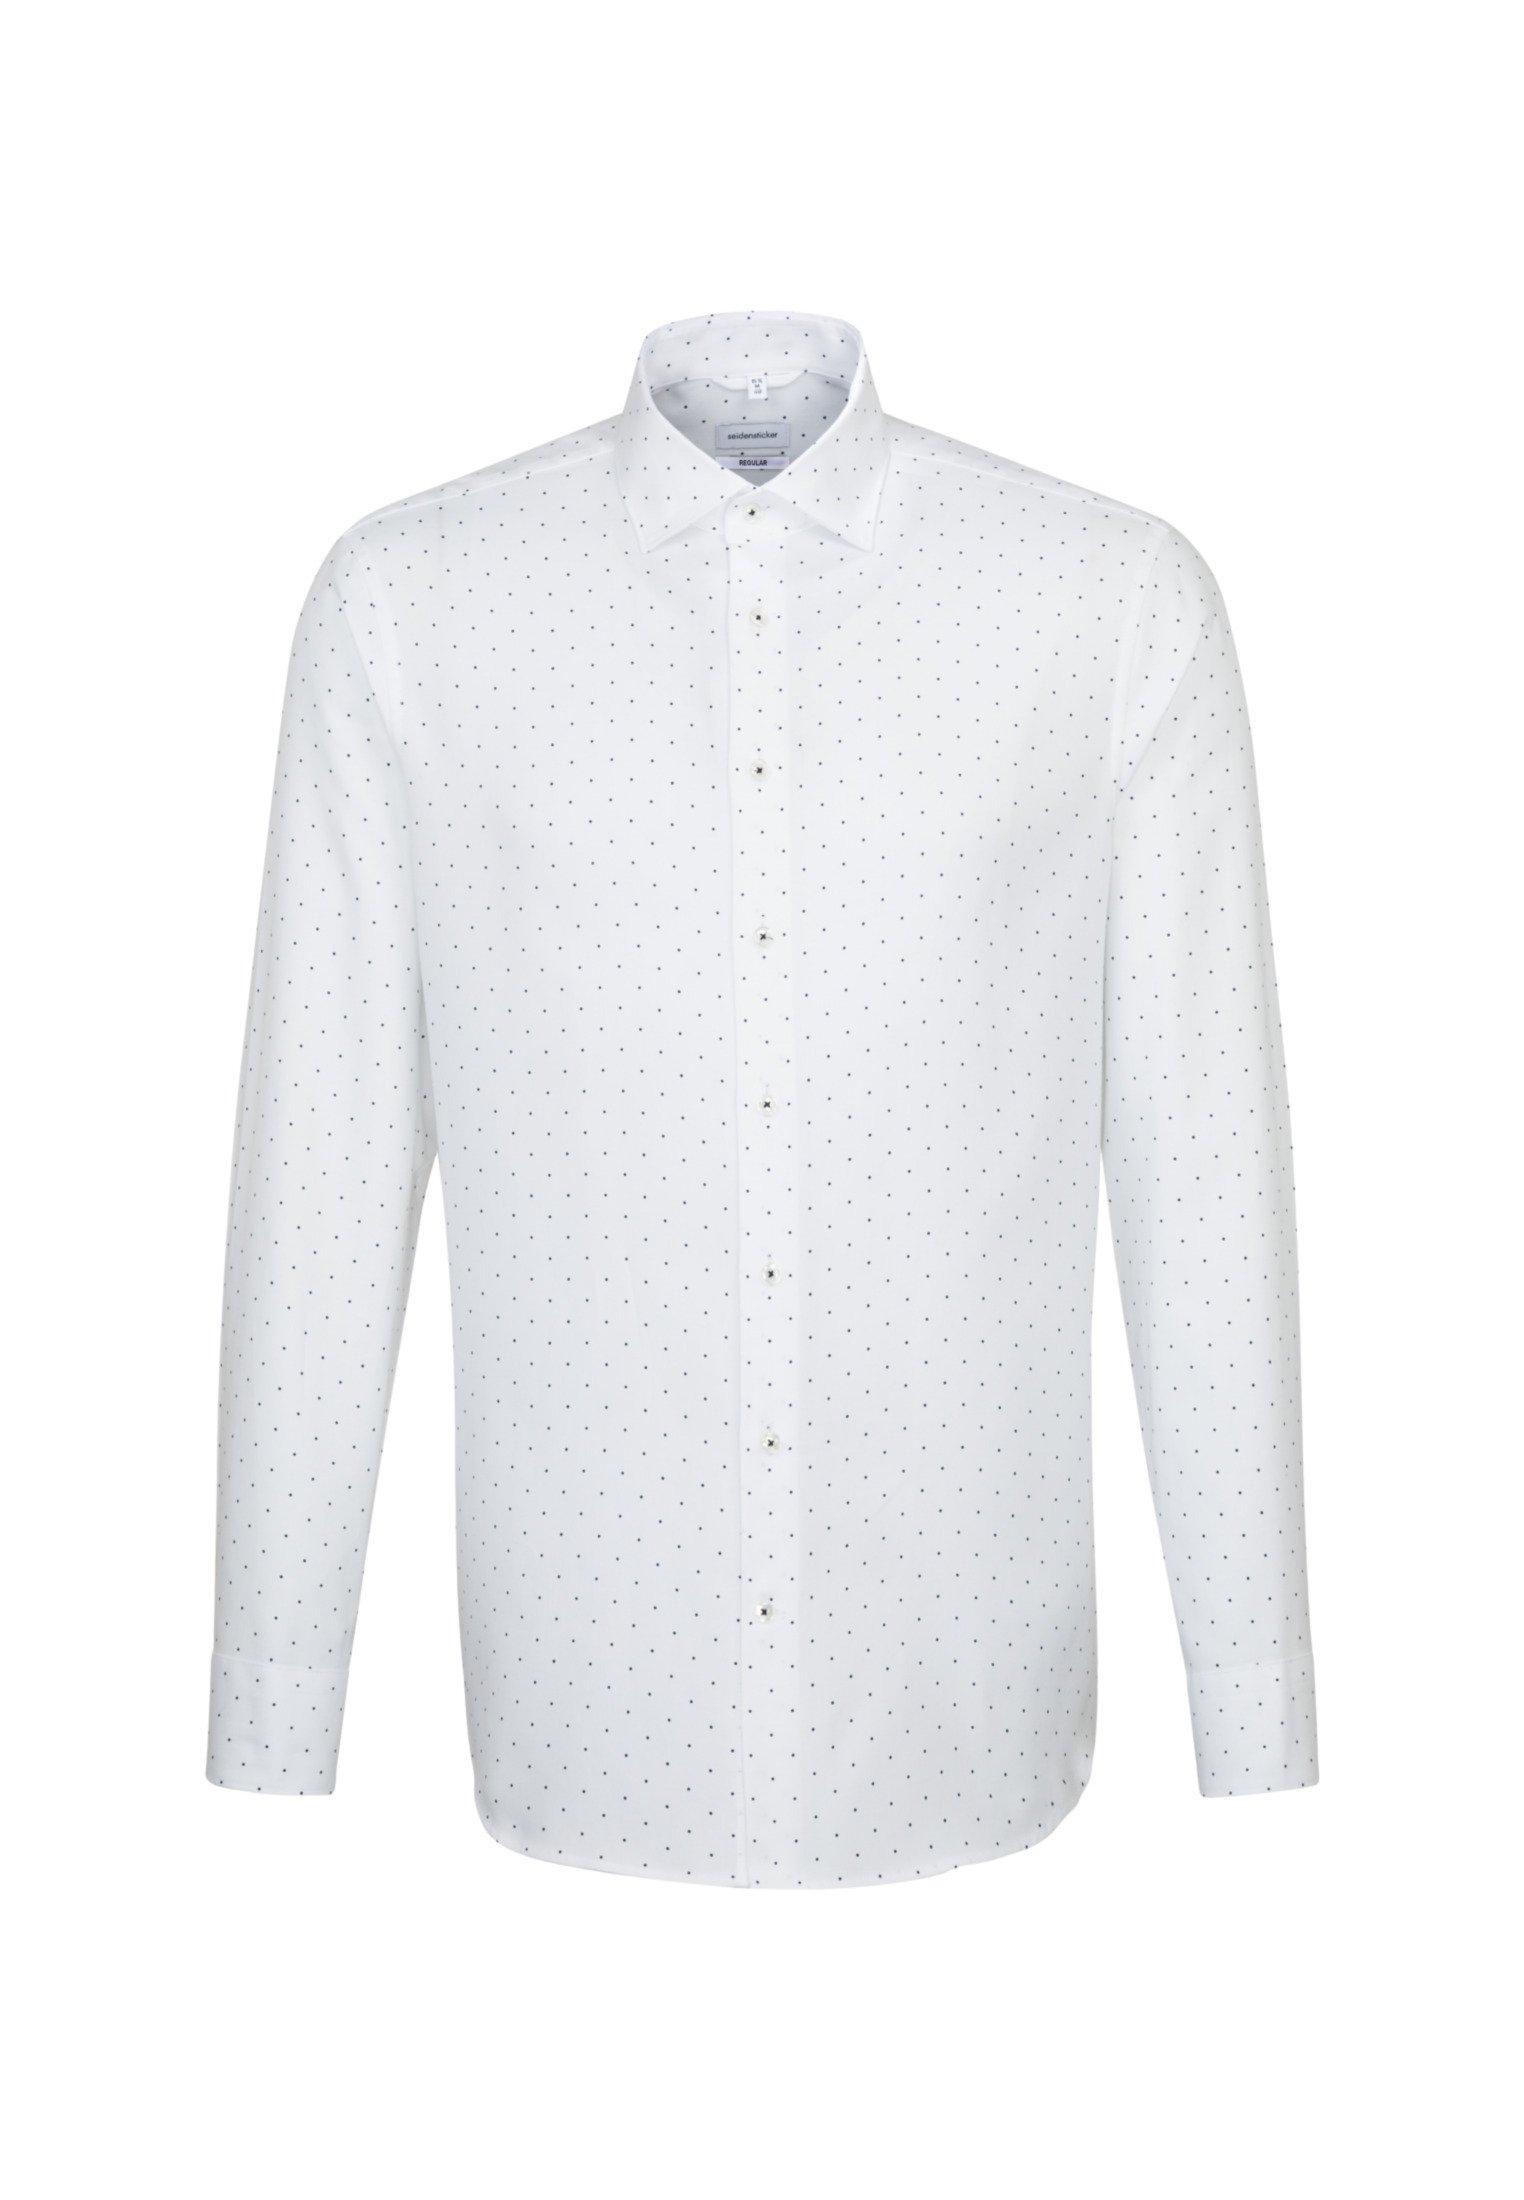 seidensticker Businessoverhemd Regular Regular lange mouwen kentkraag stippen nu online bestellen